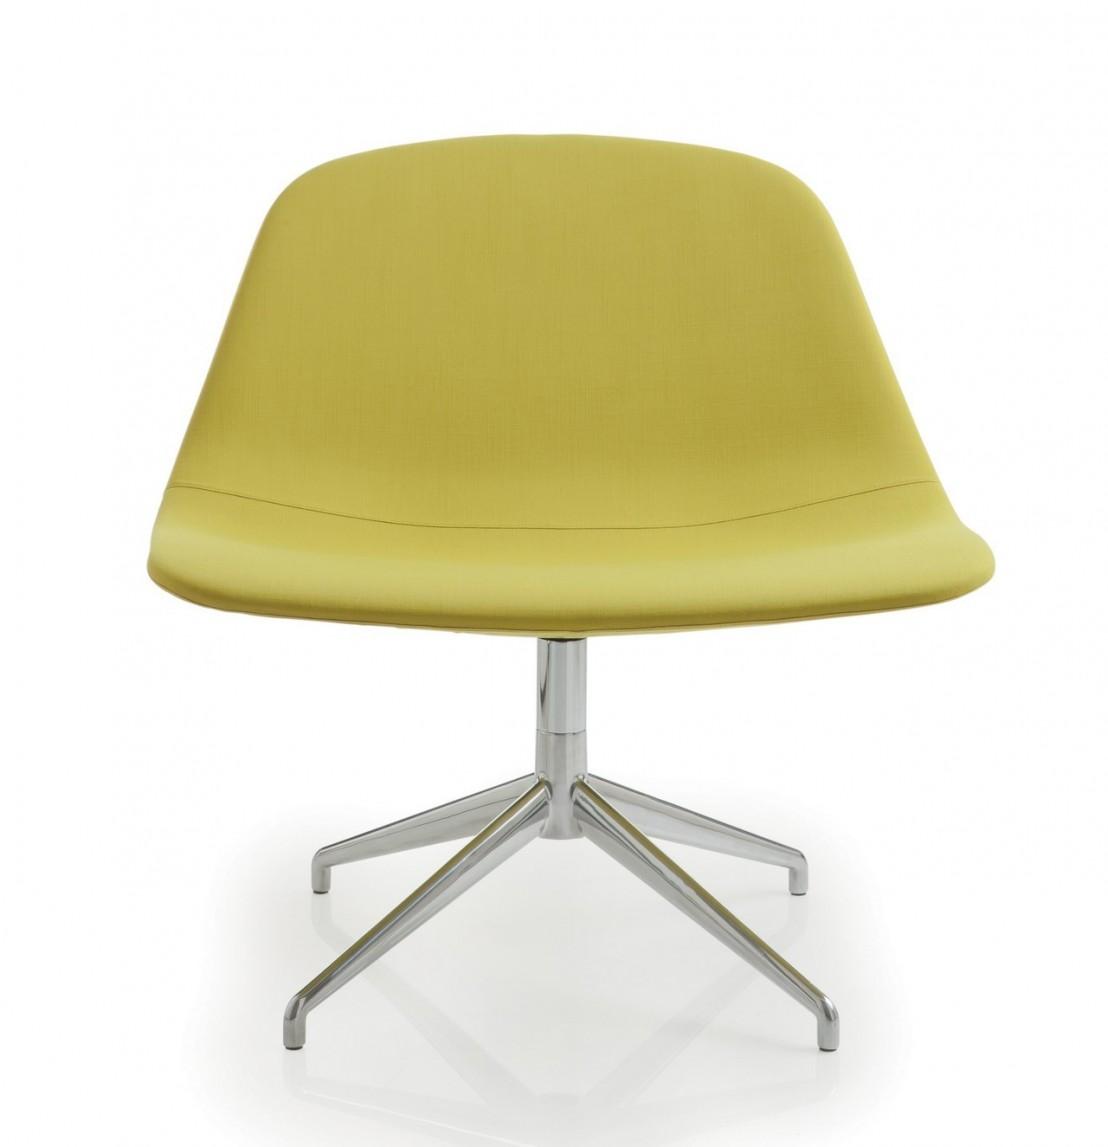 fauteuil repose pieds design cuir ou tissu llounge luxy. Black Bedroom Furniture Sets. Home Design Ideas